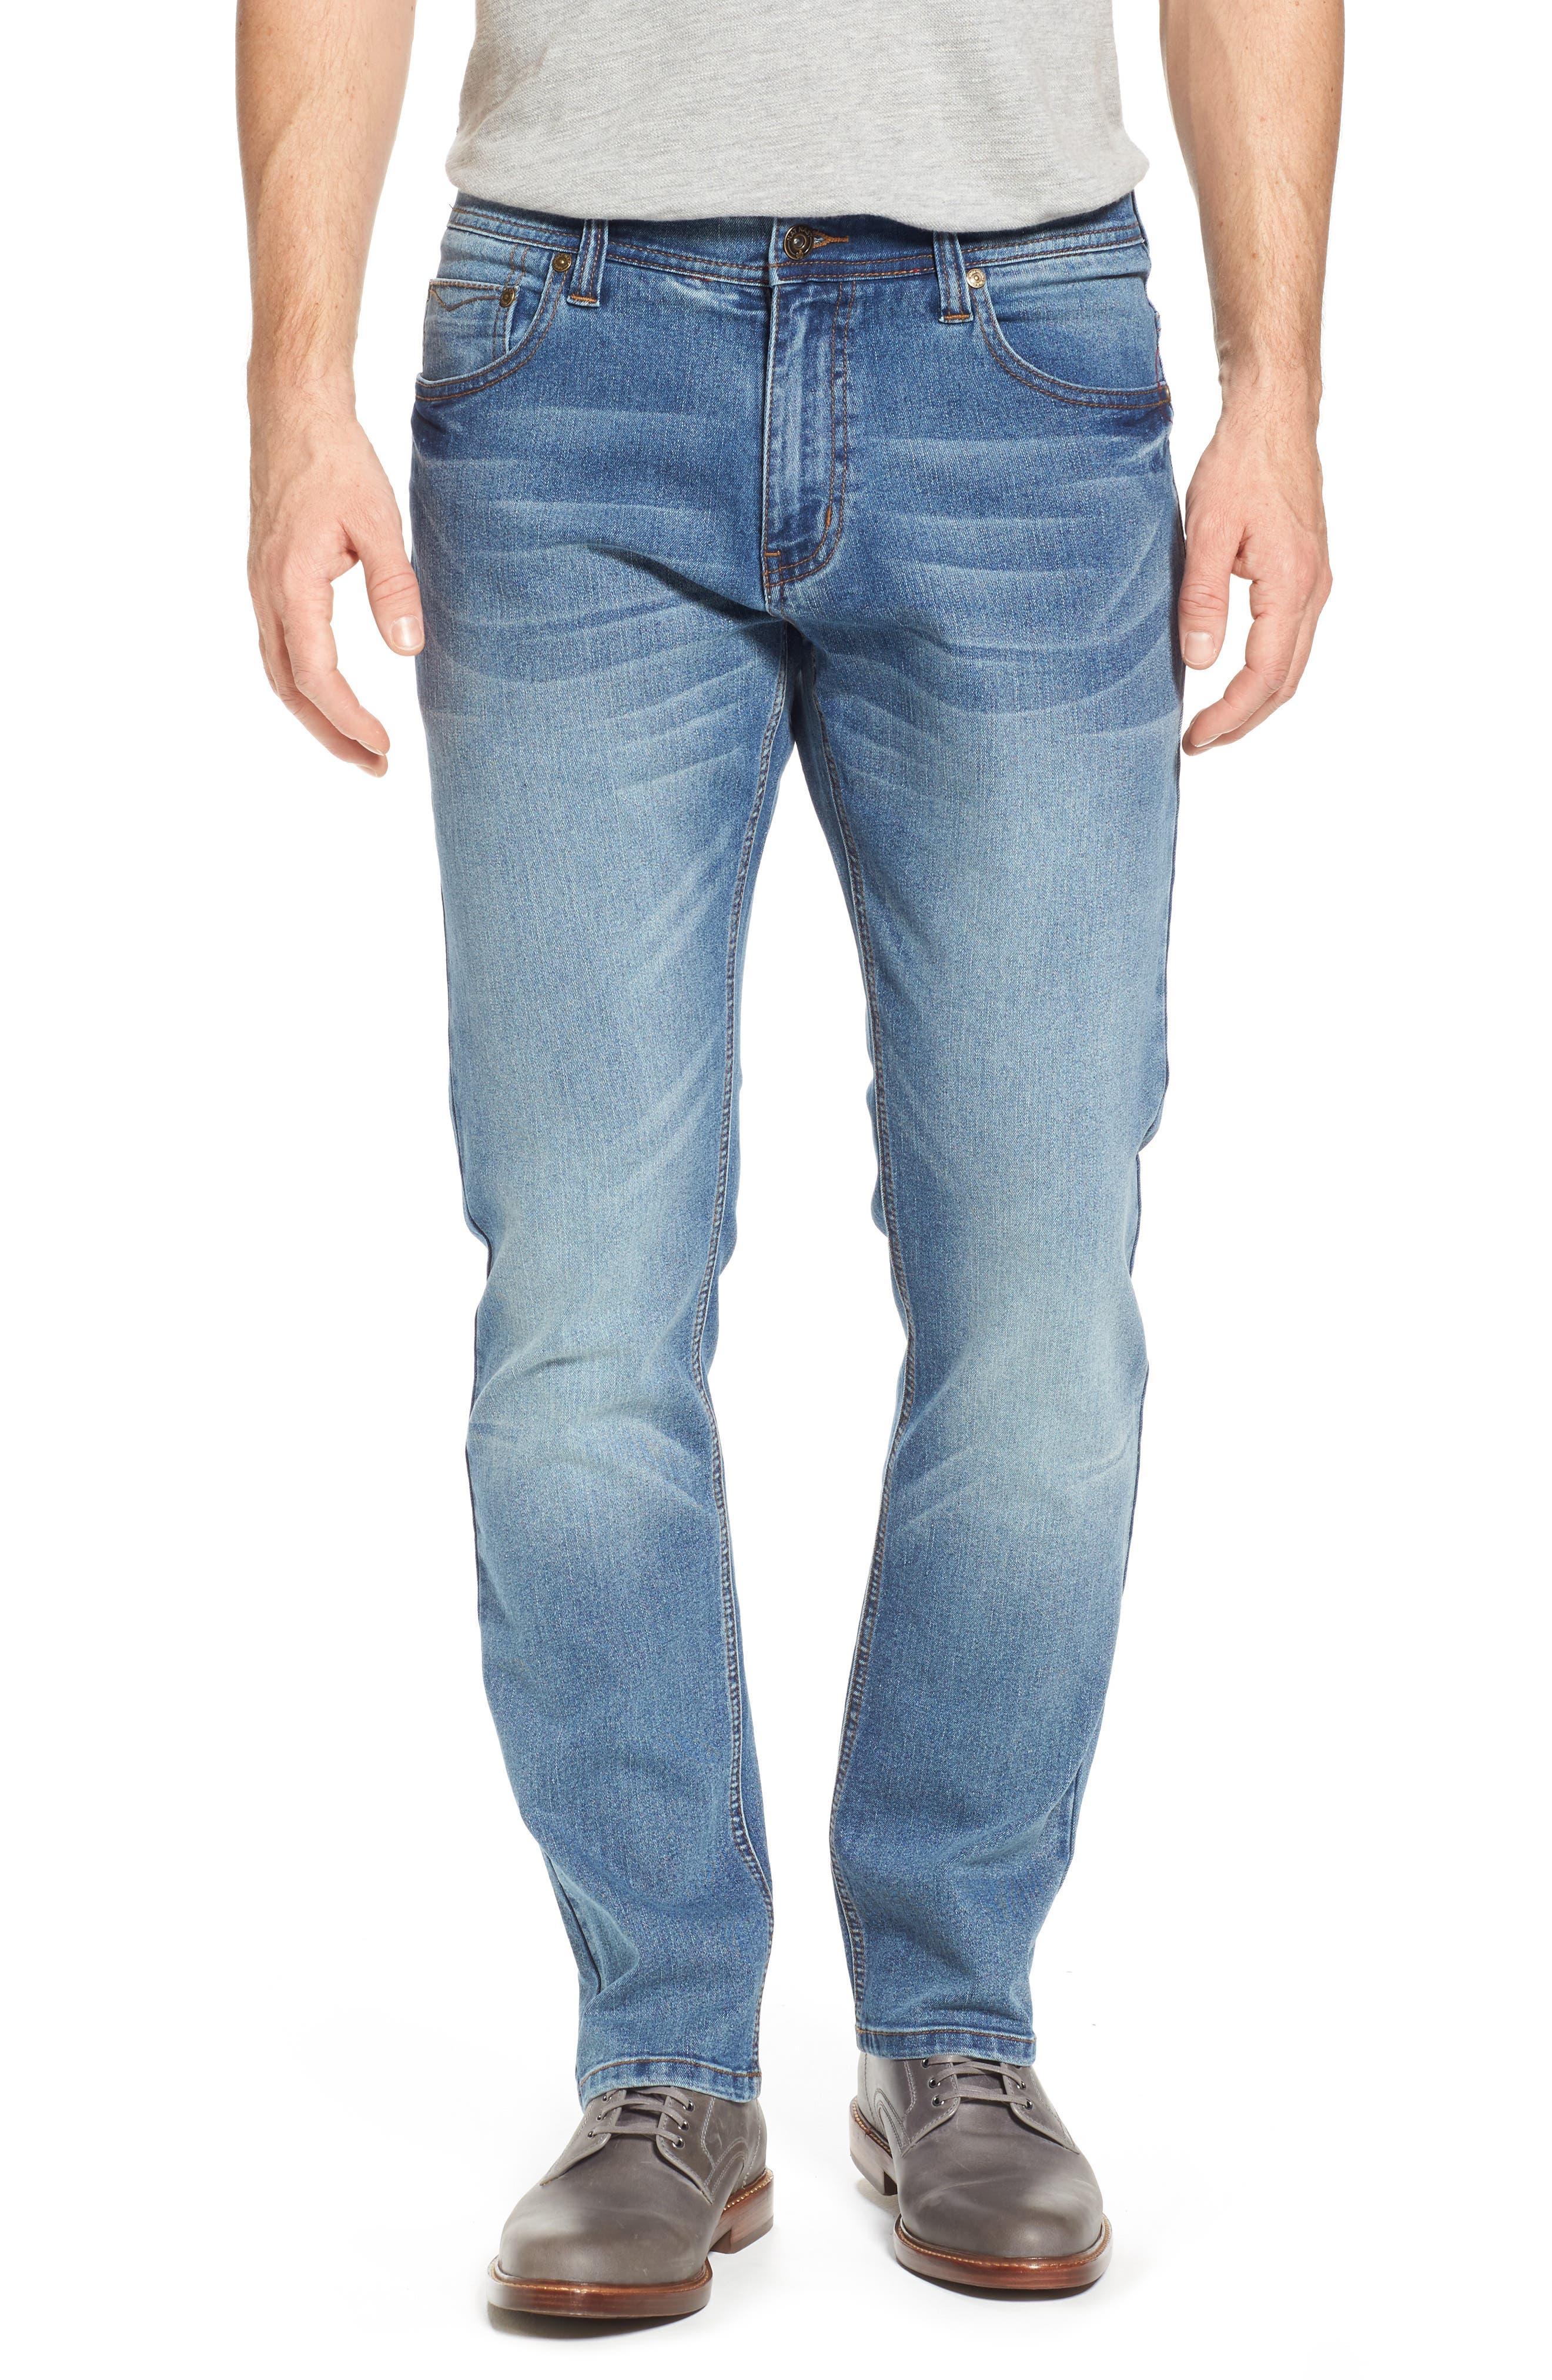 Maverick Stretch Slim Fit Jeans,                             Main thumbnail 1, color,                             Beach Wash